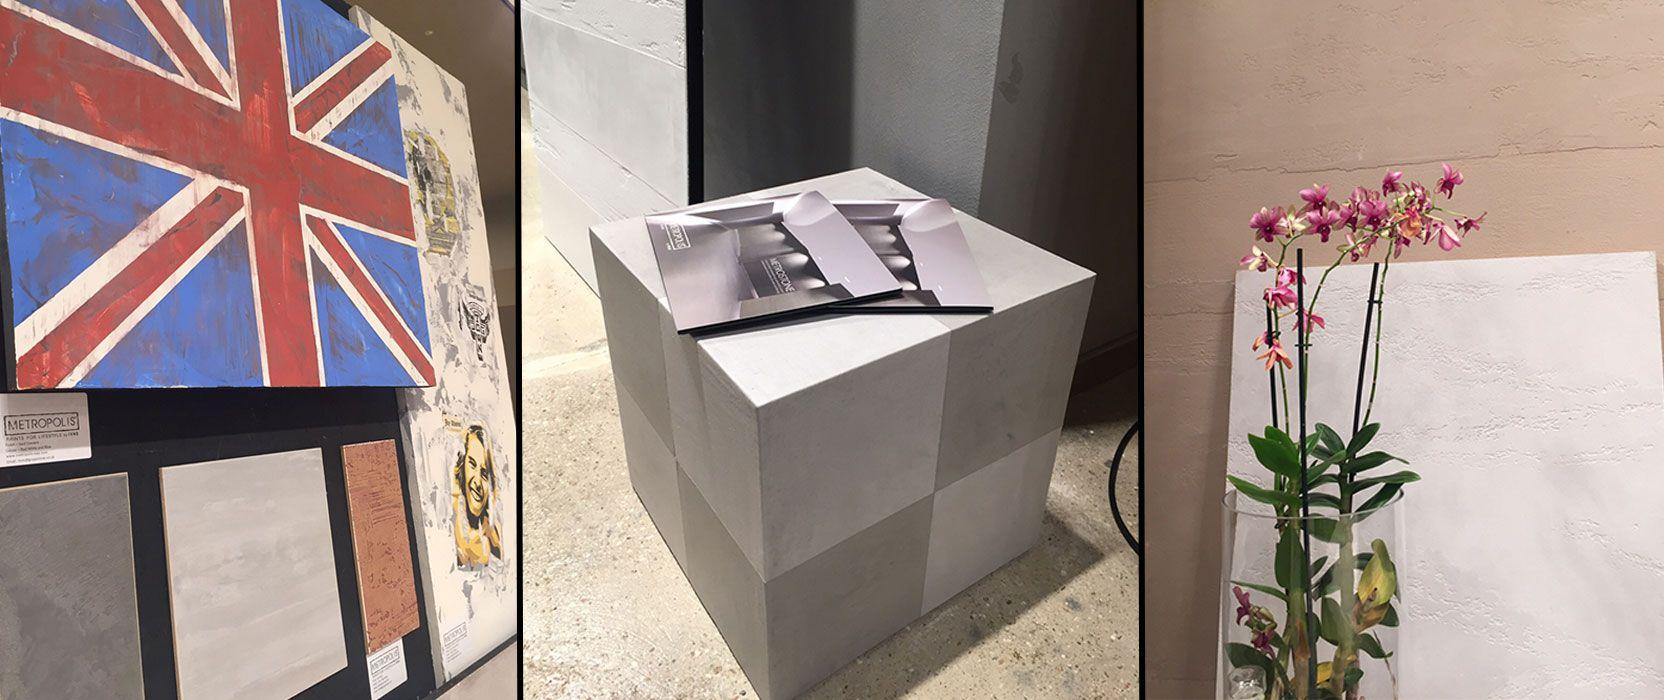 News metropolis and tisettanta the trend setting for Italian furniture design companies